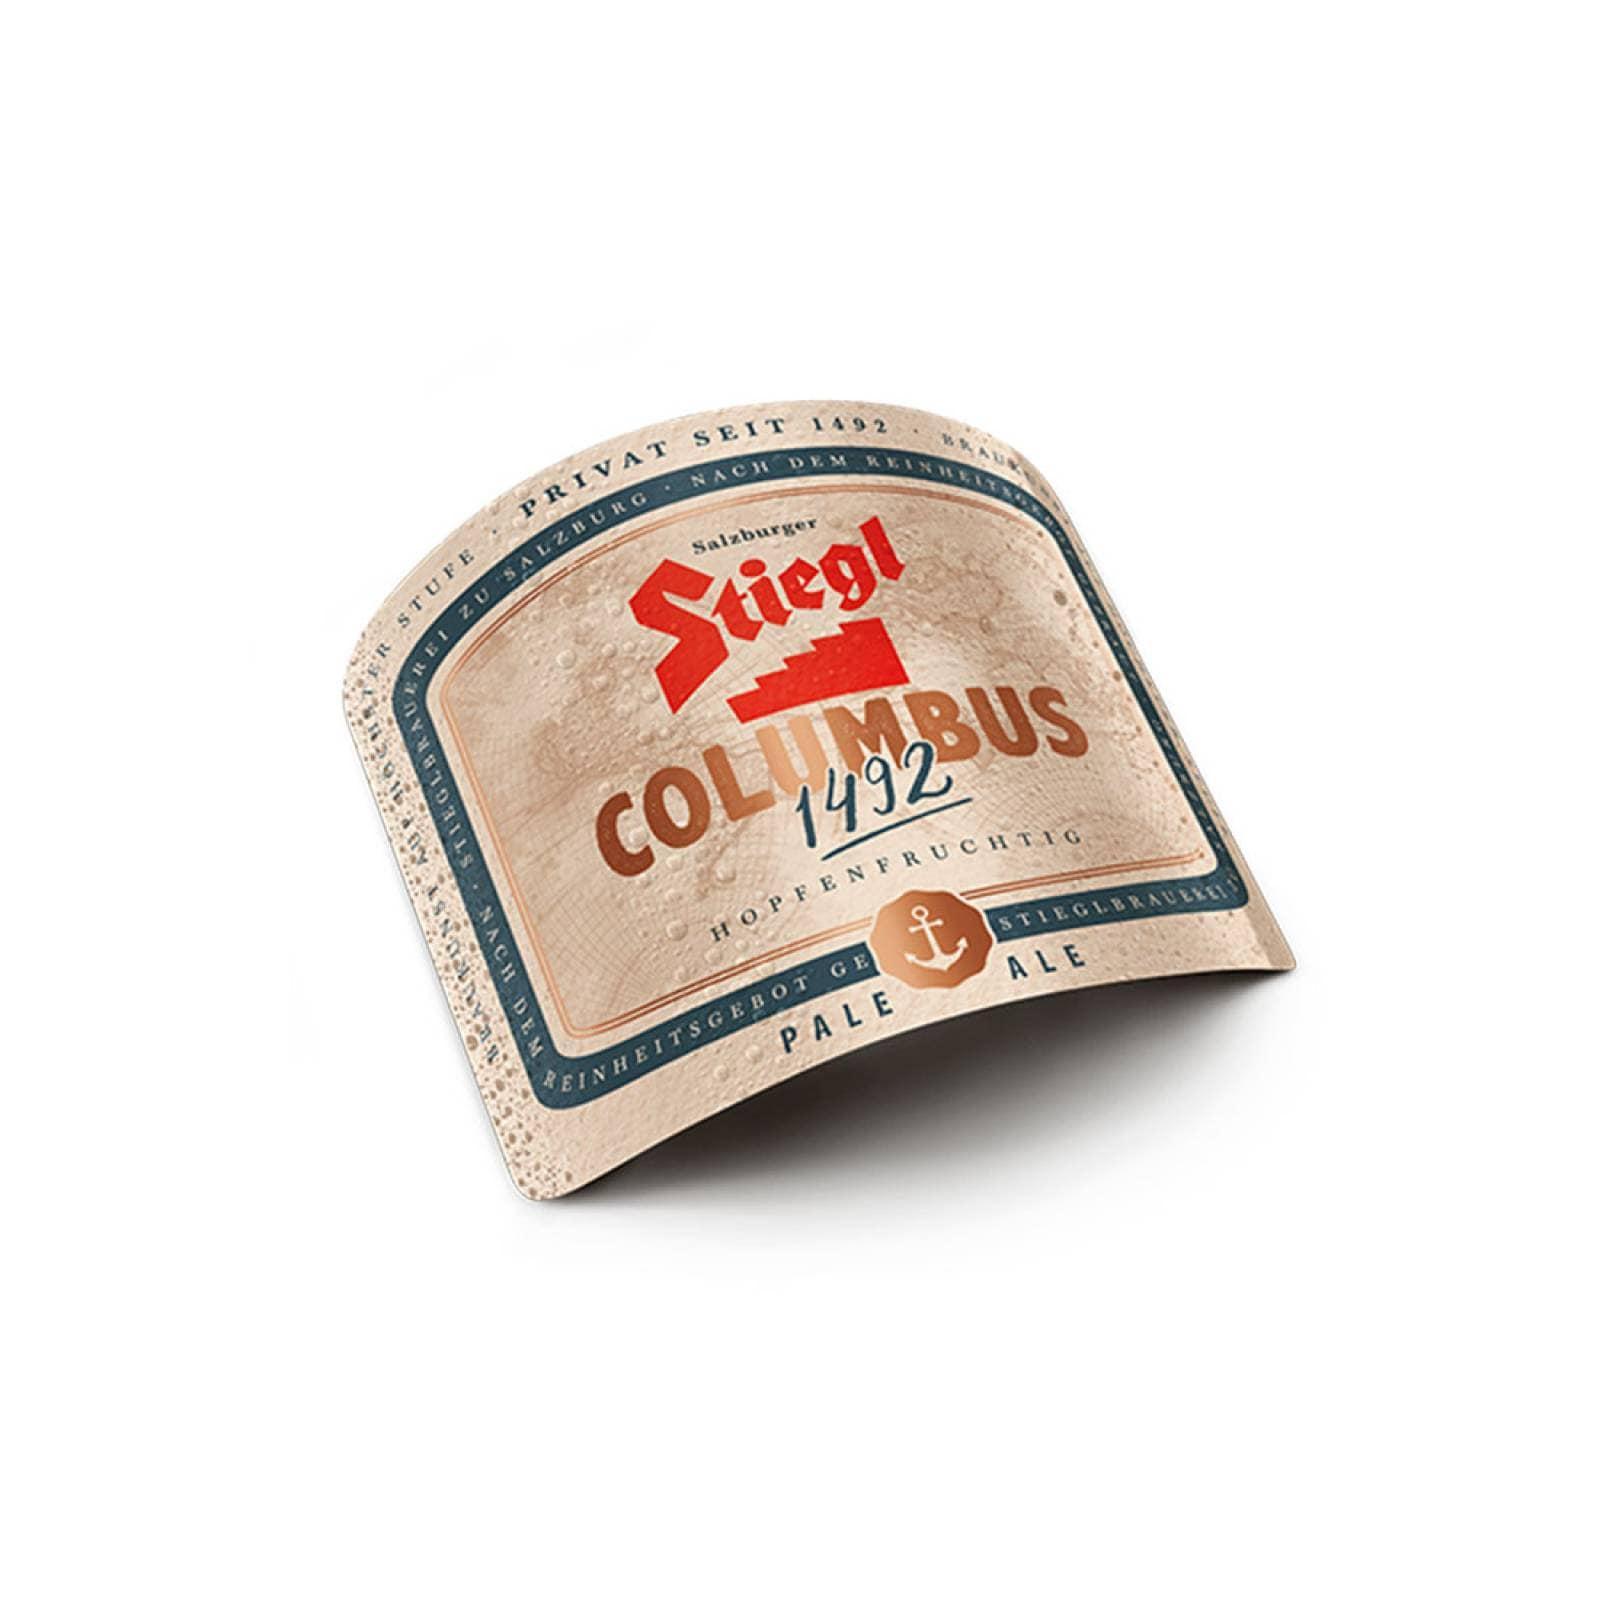 Cerveza Importada 12 Pzs 330 ml c/u Stiegl Columbus 1492